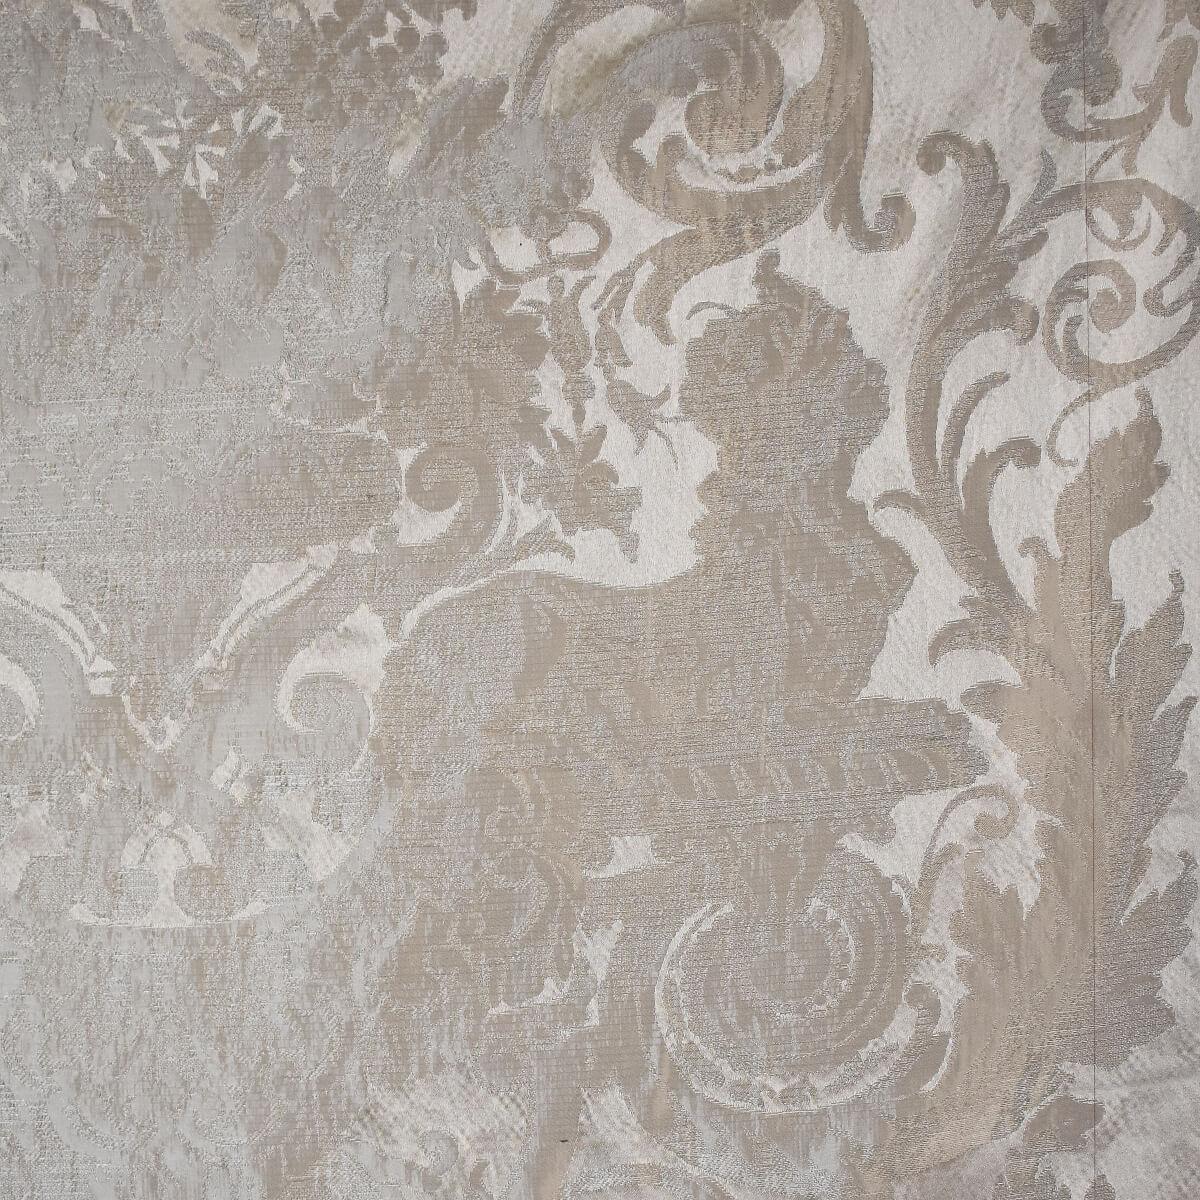 Damasco Grottesche Craquelé 356-31035 perla-grigio | Tessiture Bevilacqua